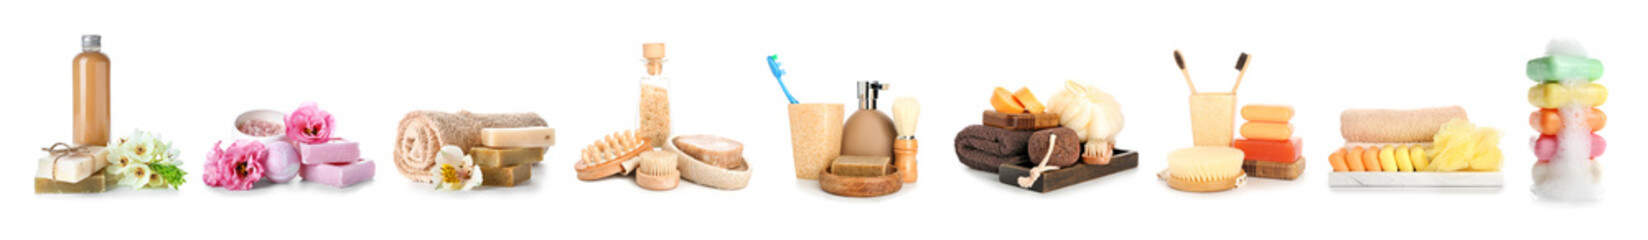 Fototapeta na wymiar Composition with spa items on white background